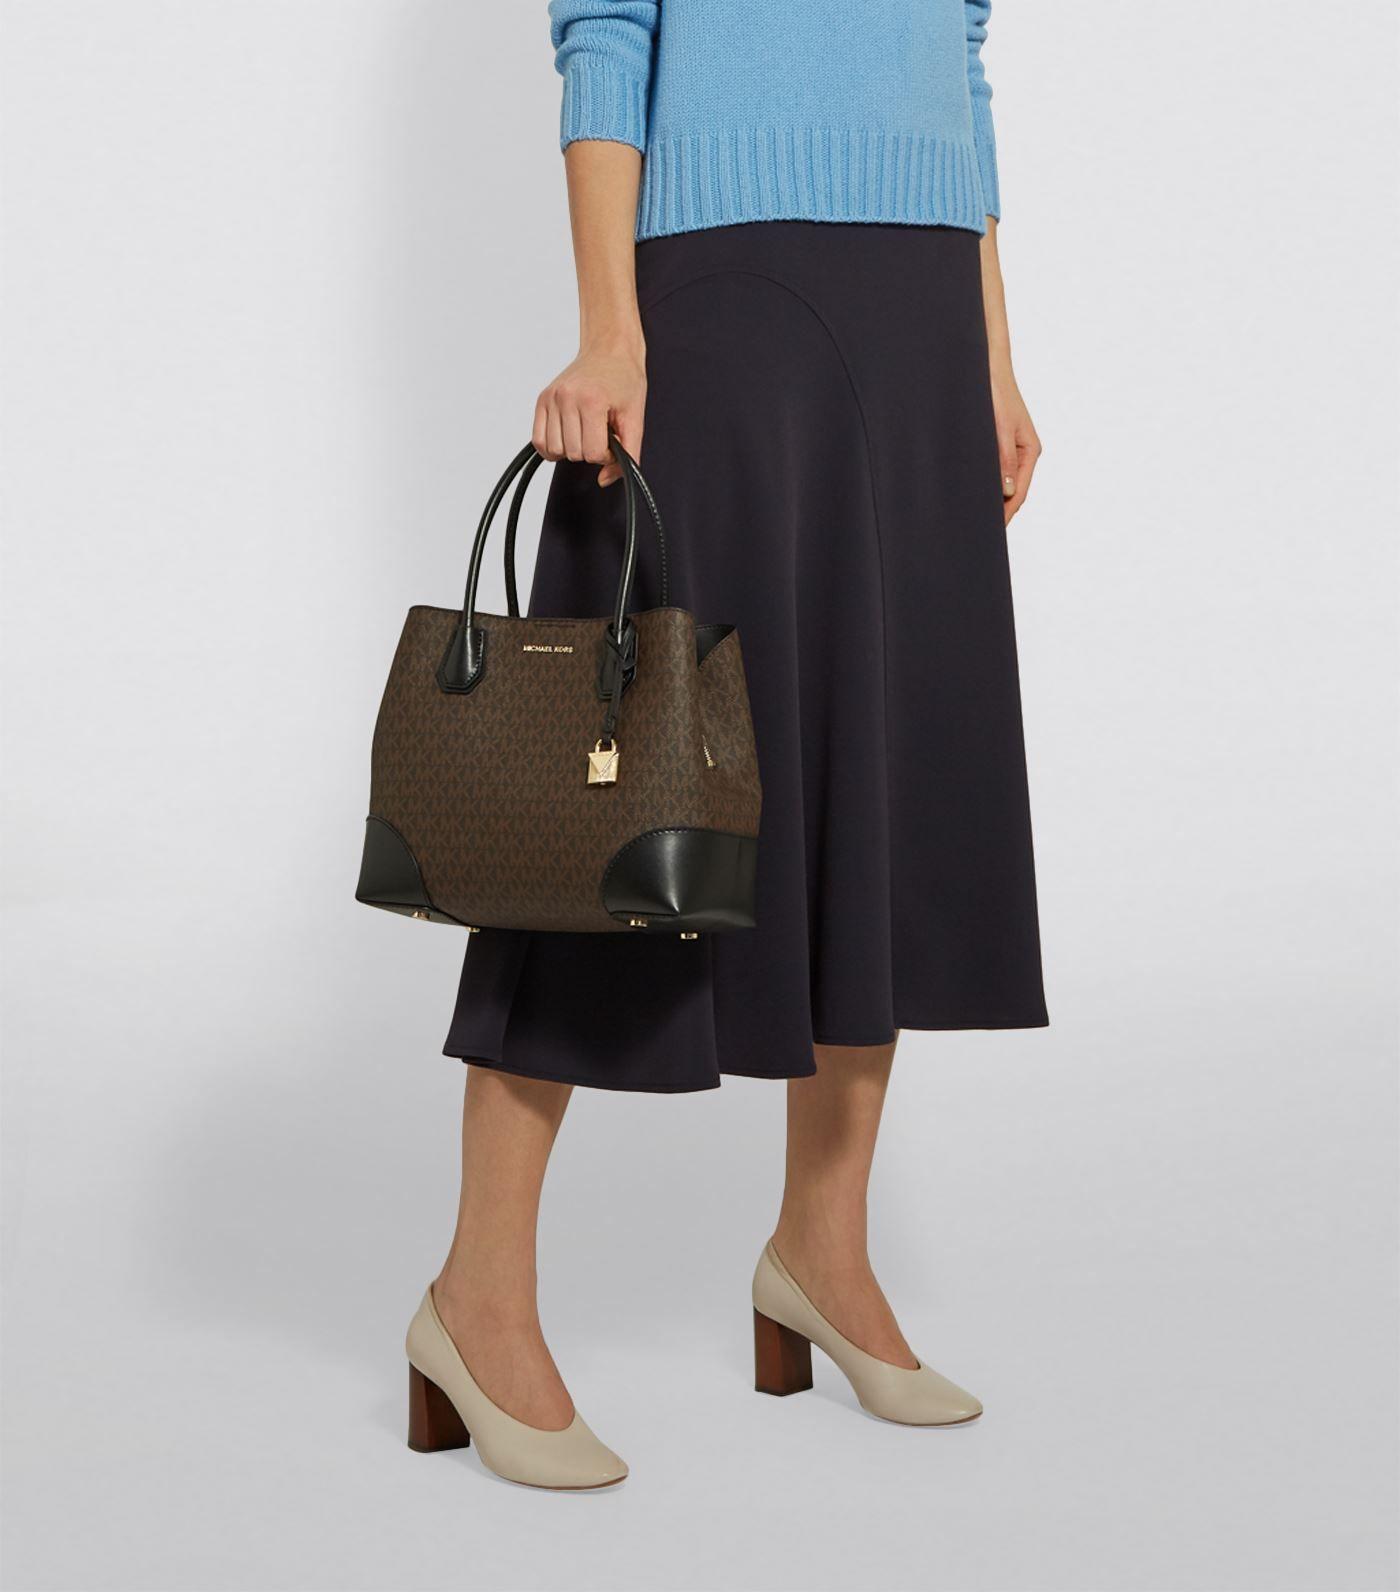 separation shoes website for discount promo code Medium Canvas Mercer Gallery Bag   Michael kors, Harrods, Bags